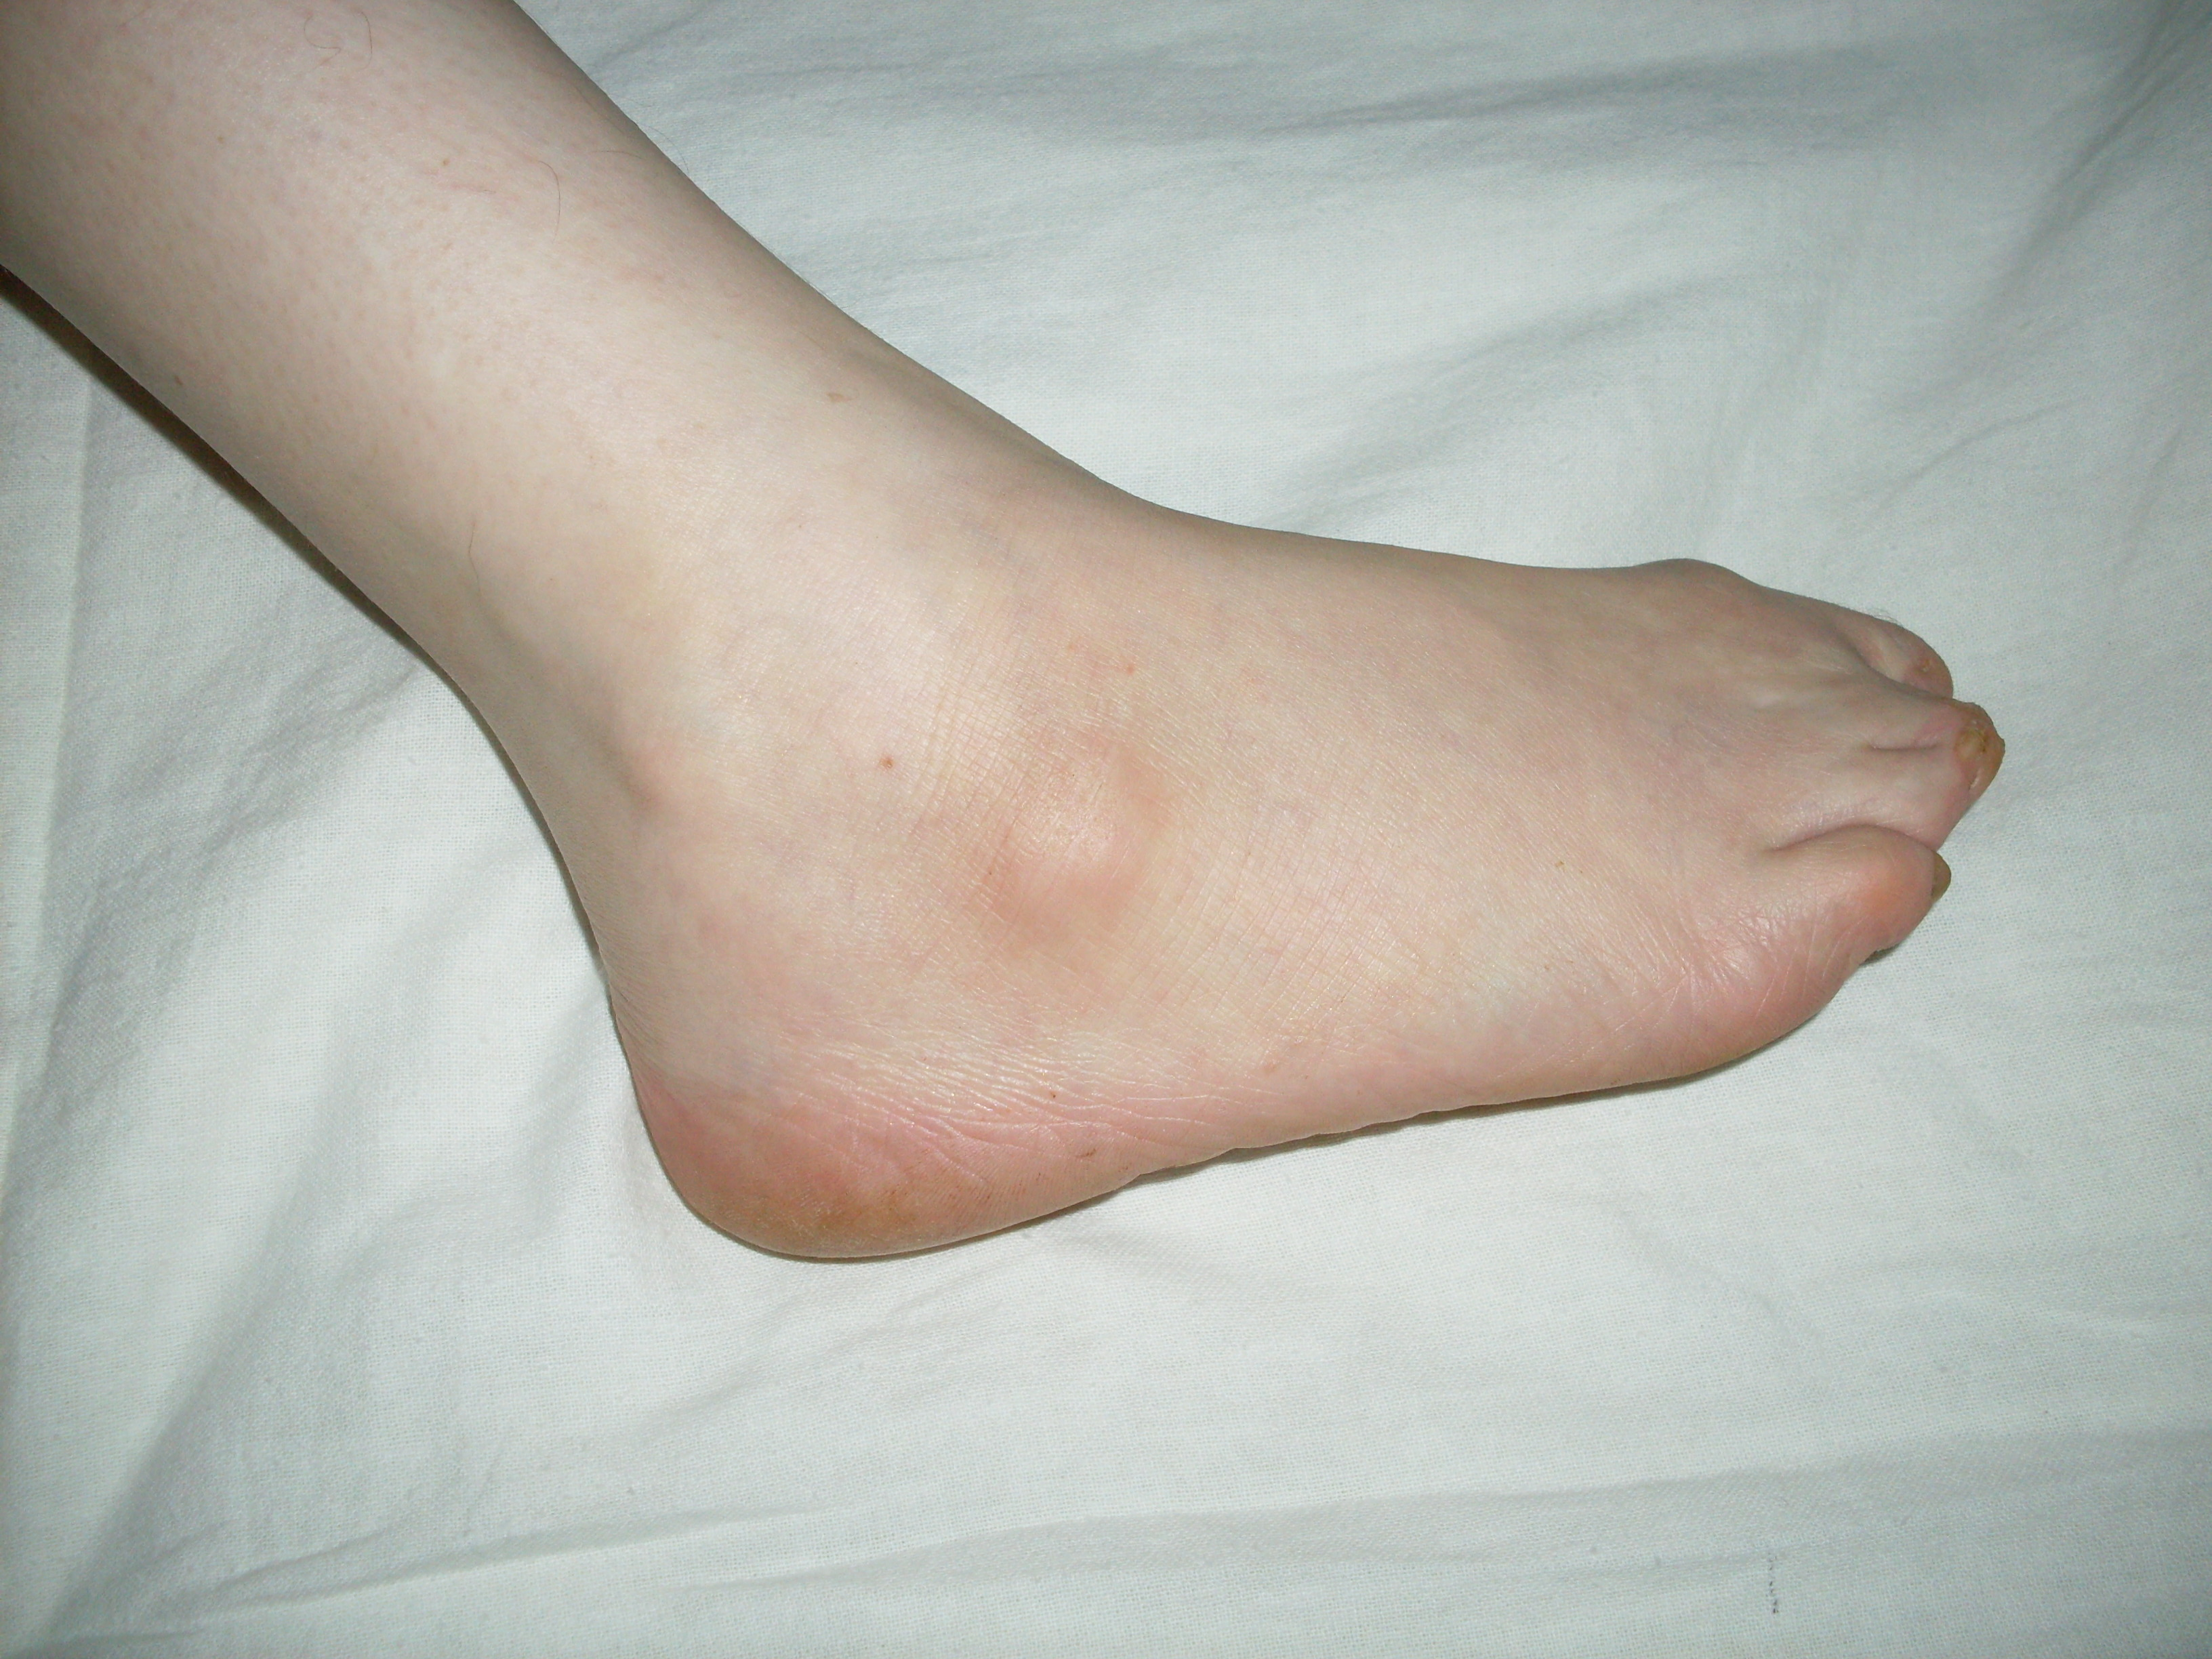 липома фото на ноге